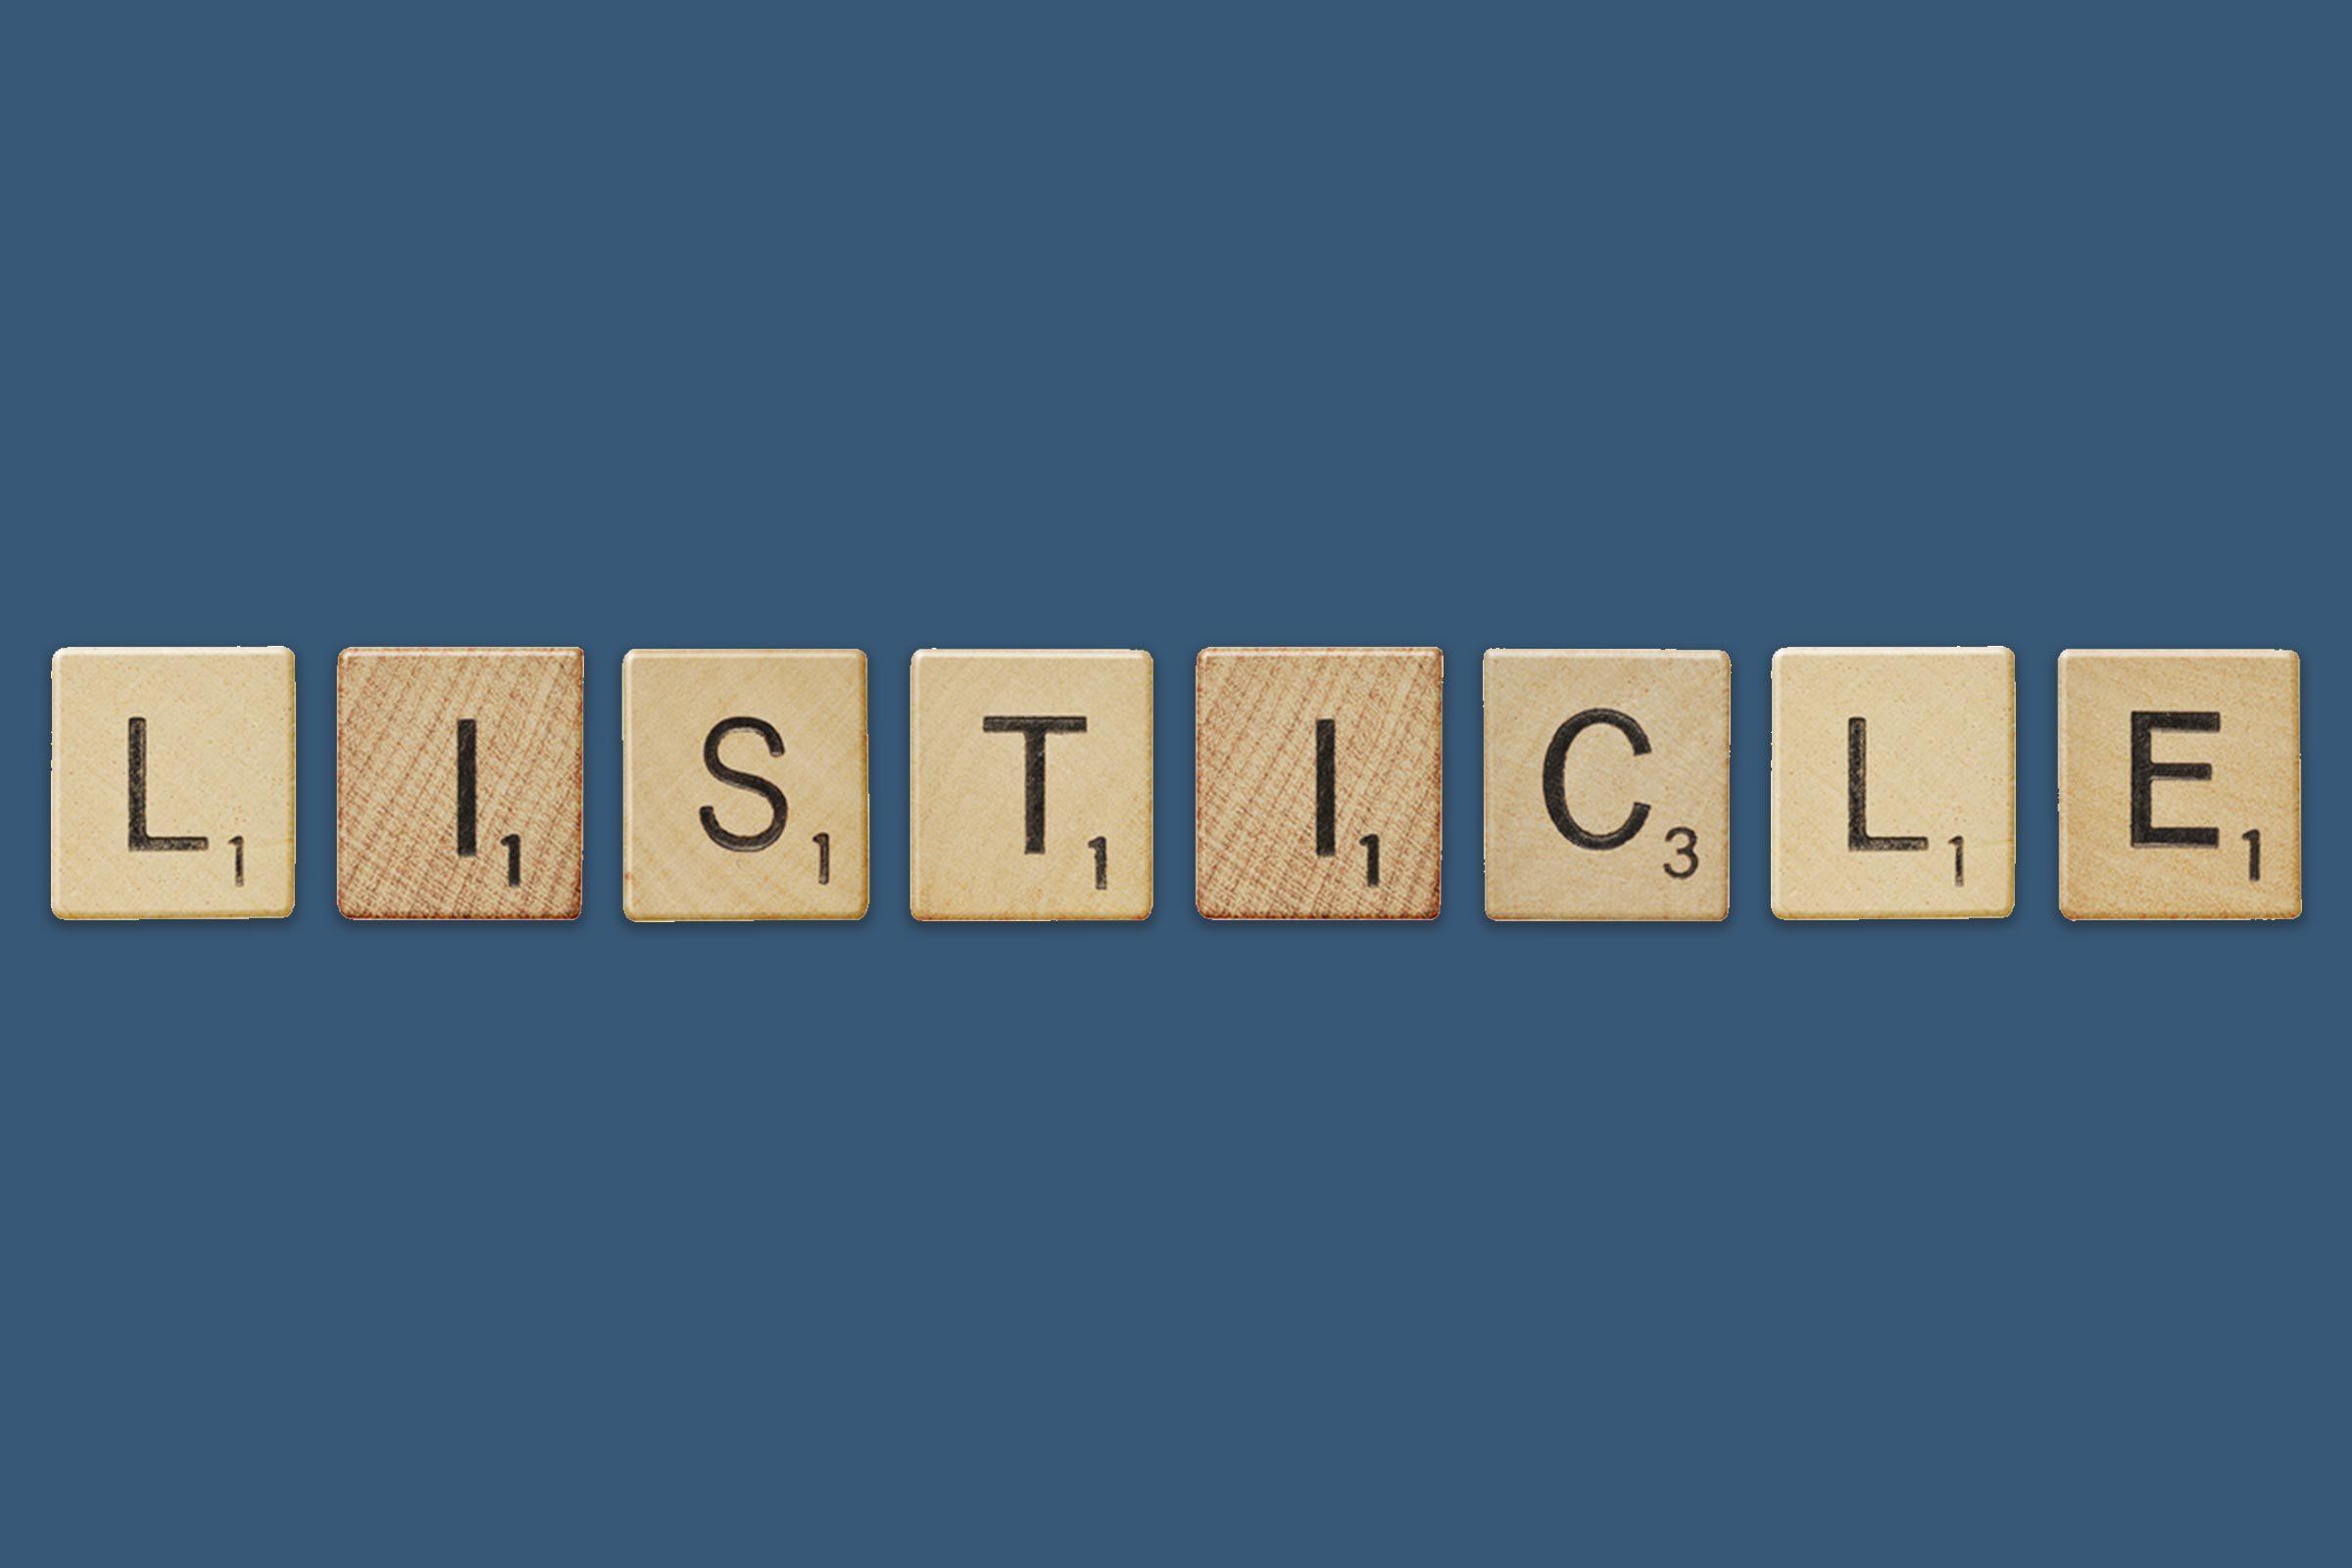 listicle